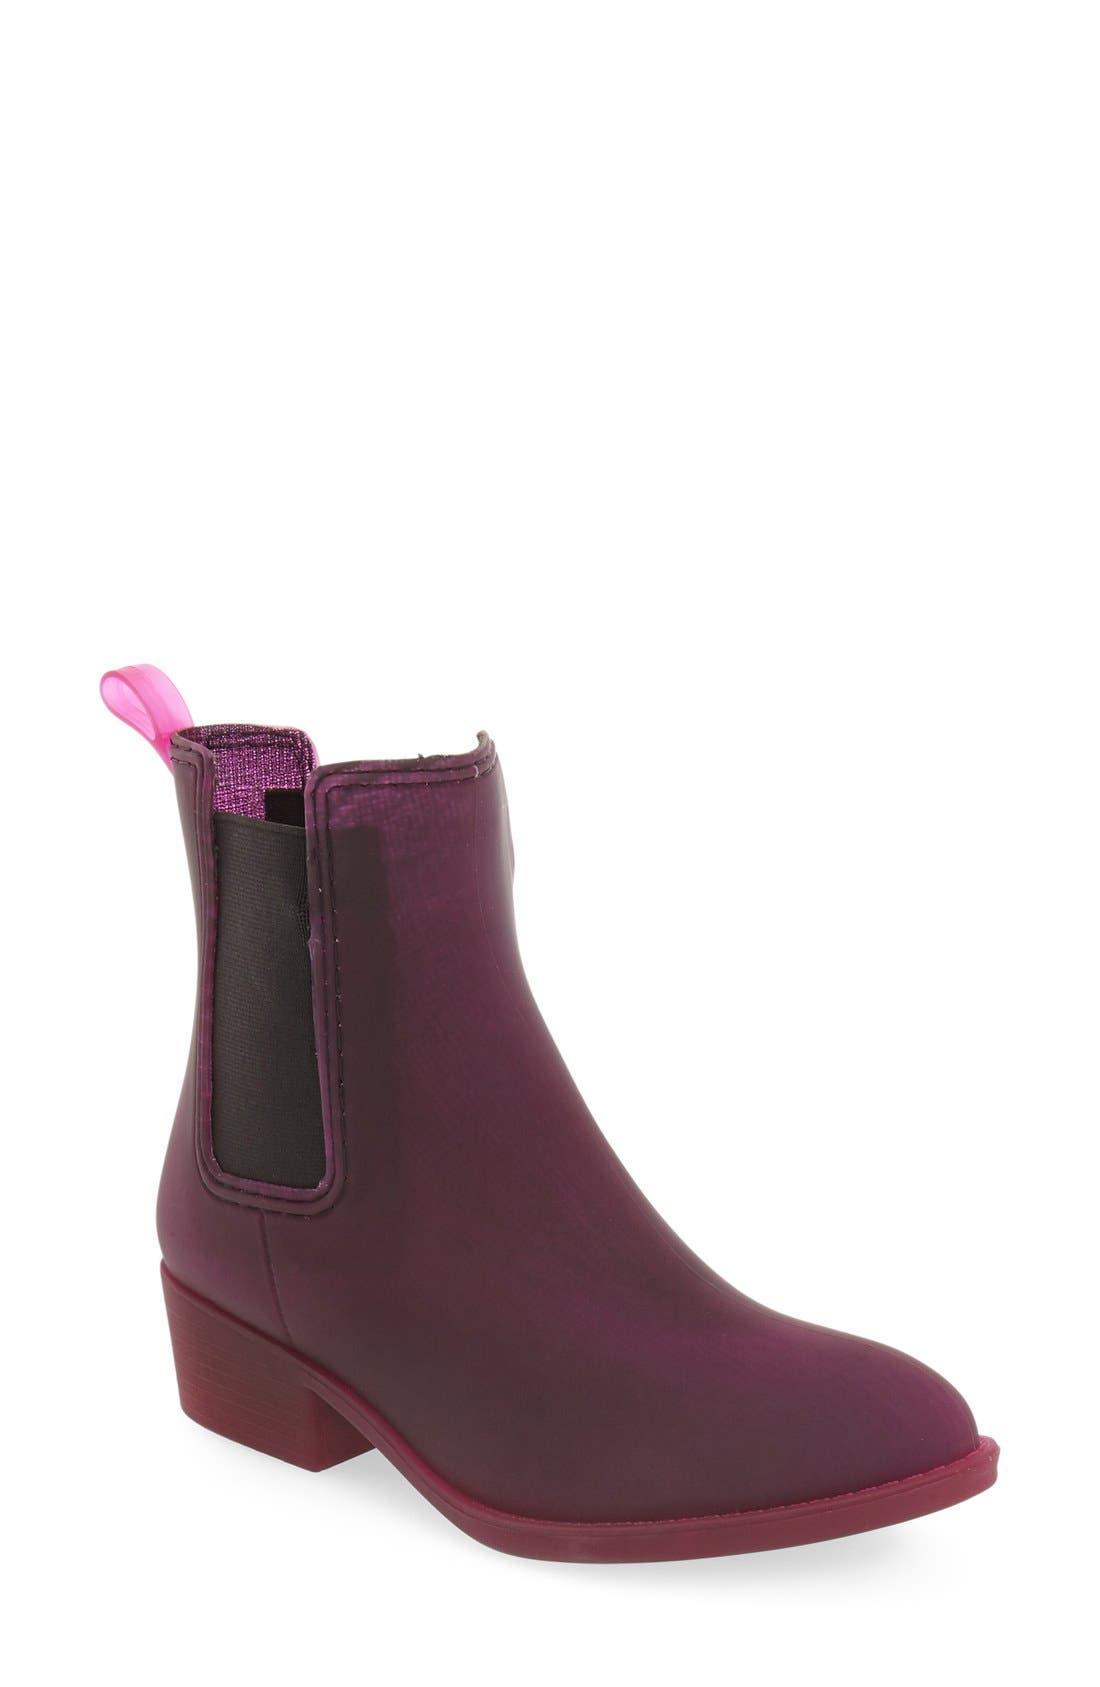 Alternate Image 1 Selected - Jeffrey Campbell 'Stormy' Rain Boot (Women)